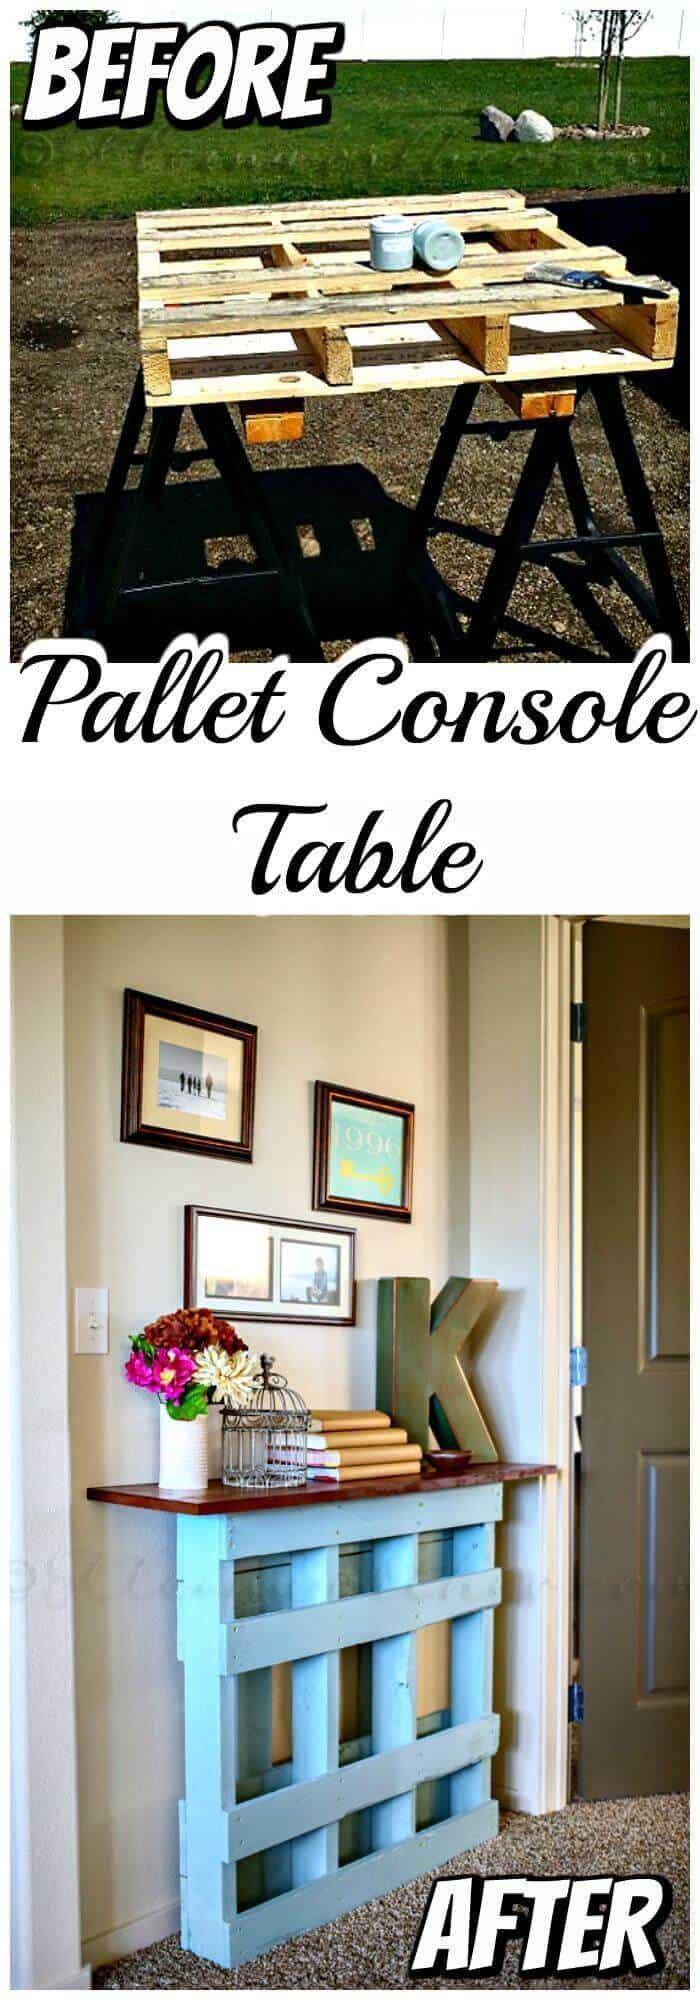 Proyecto de mesa consola de paleta de bricolaje